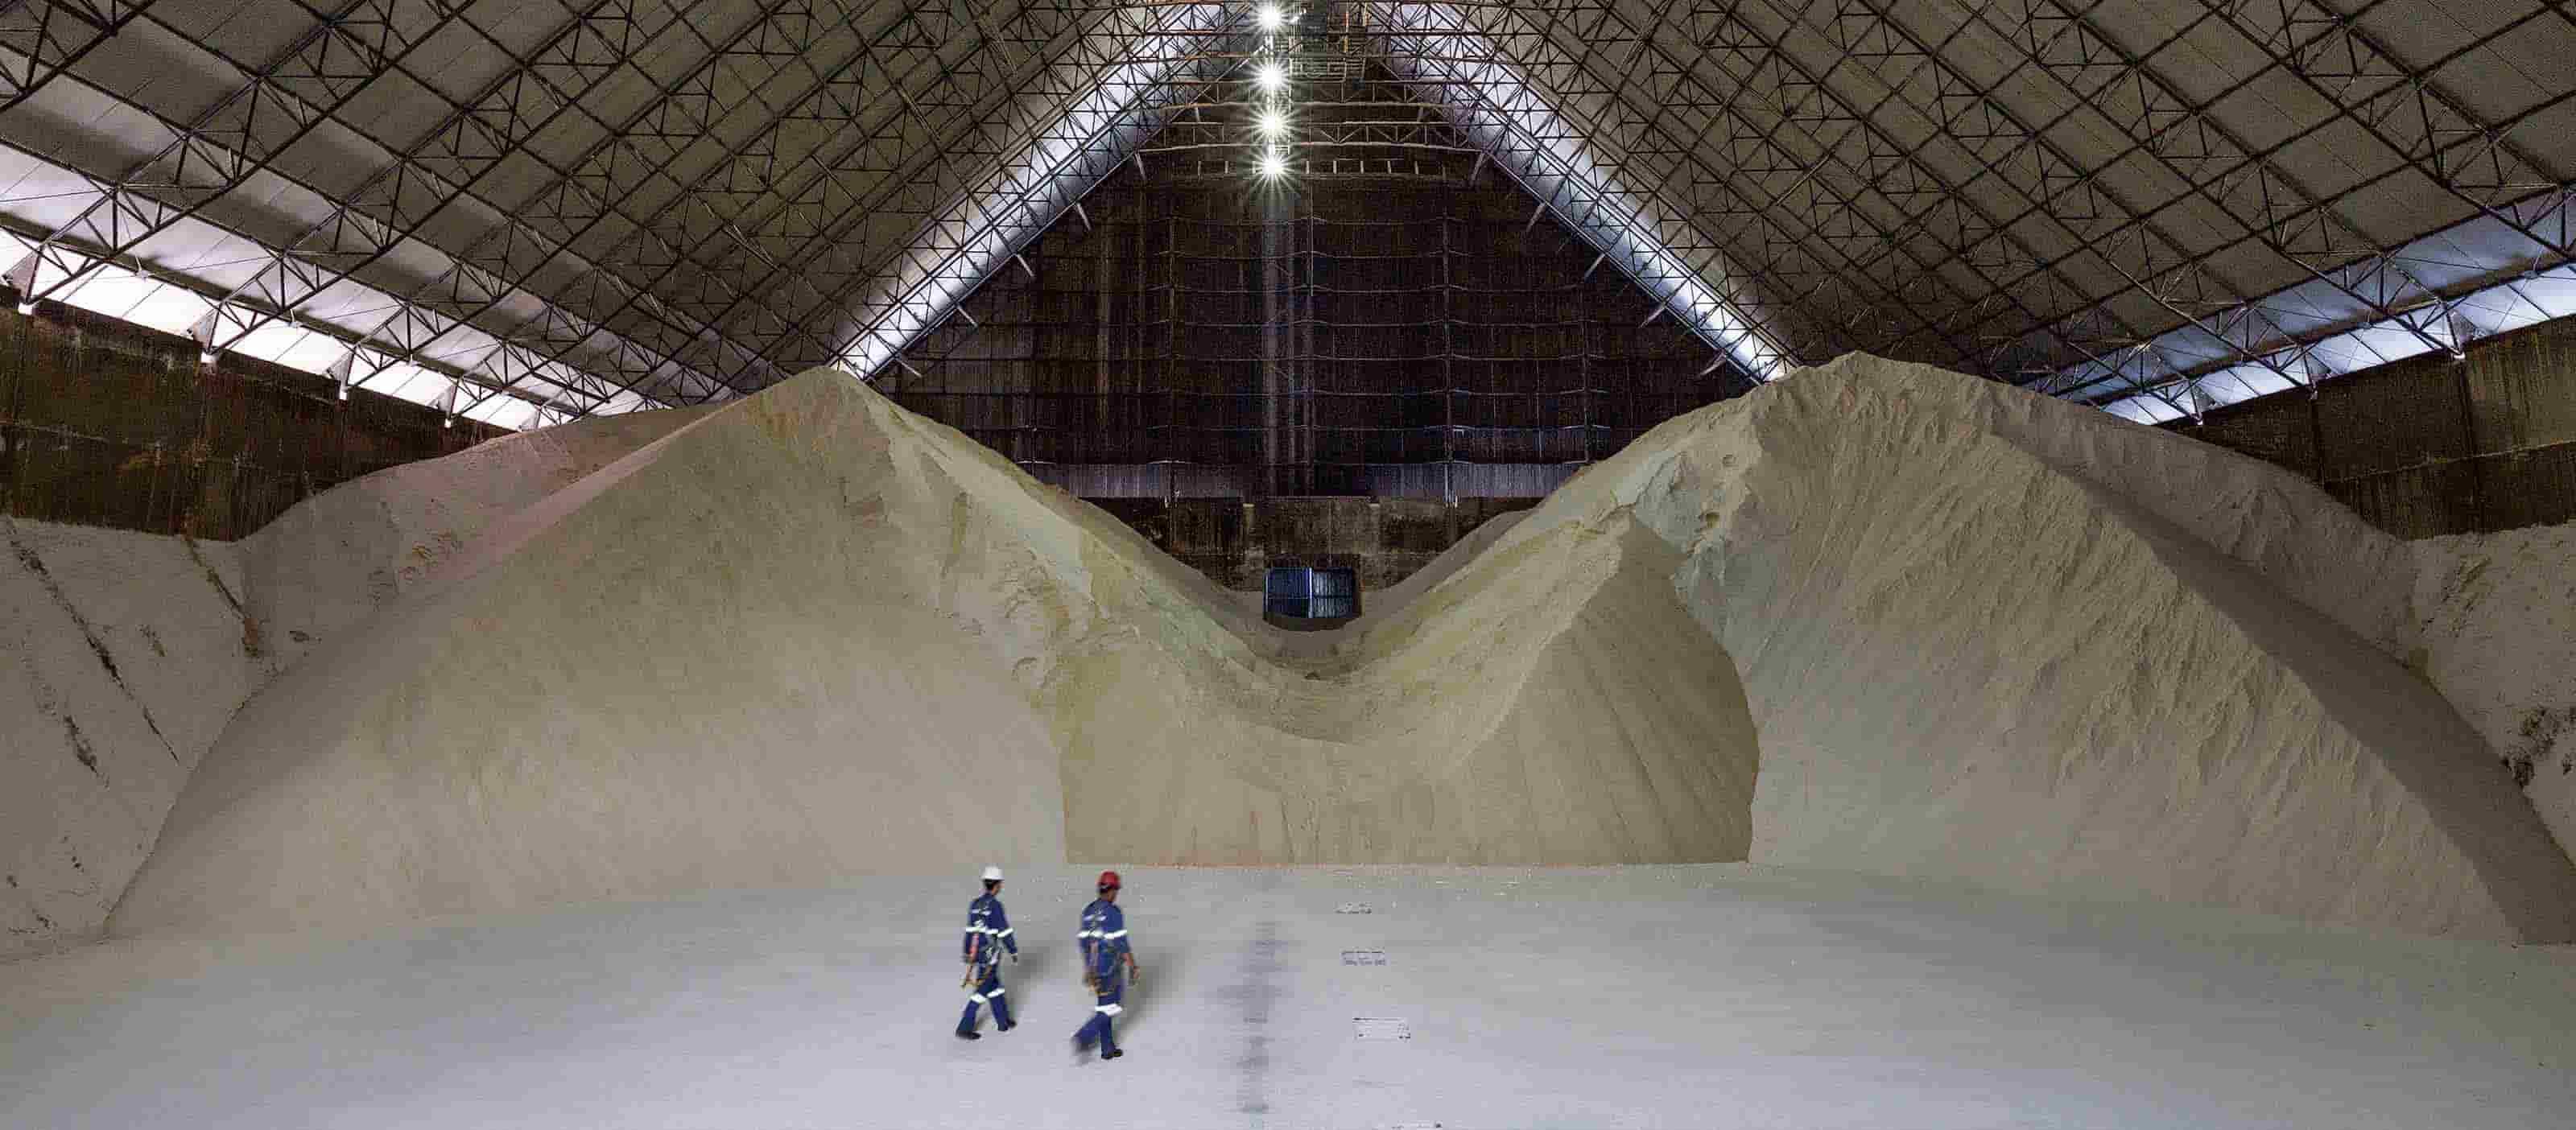 Copersucar sugar cane exporter uses Proficy HMI/SCADA software to help manage operations